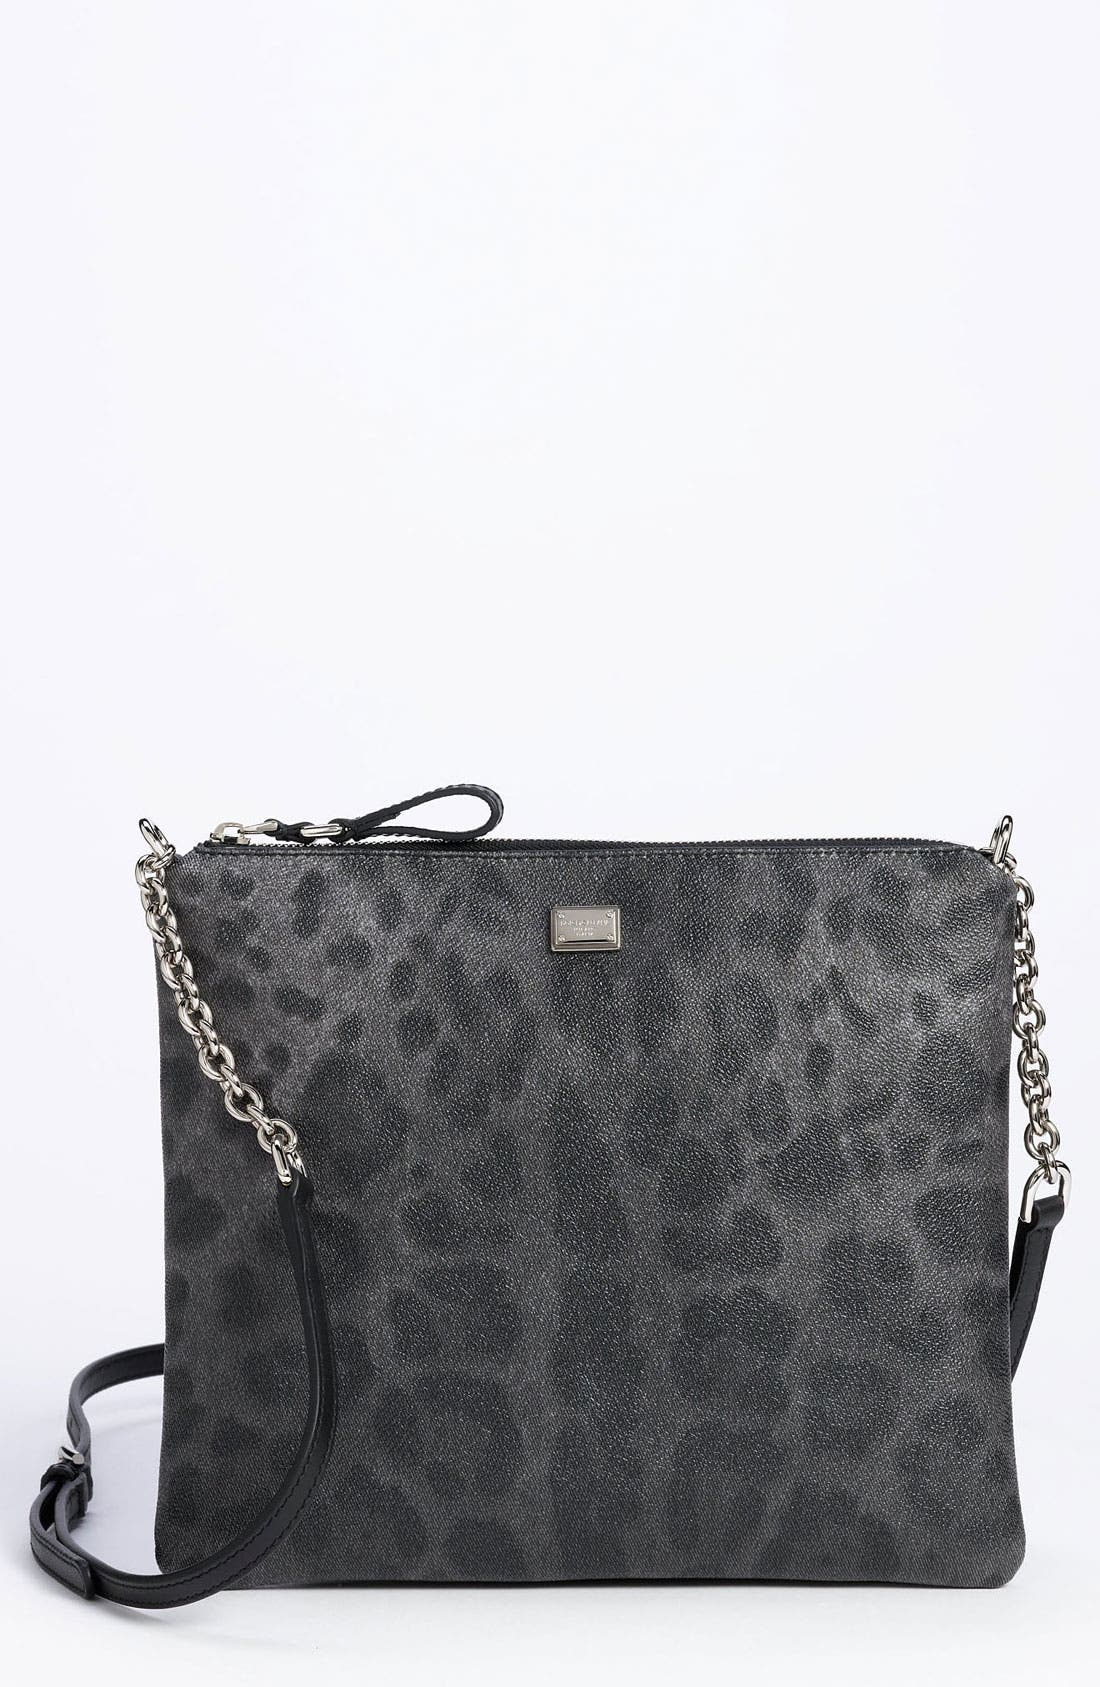 Alternate Image 1 Selected - Dolce&Gabbana 'Miss Cleo' Crossbody Bag